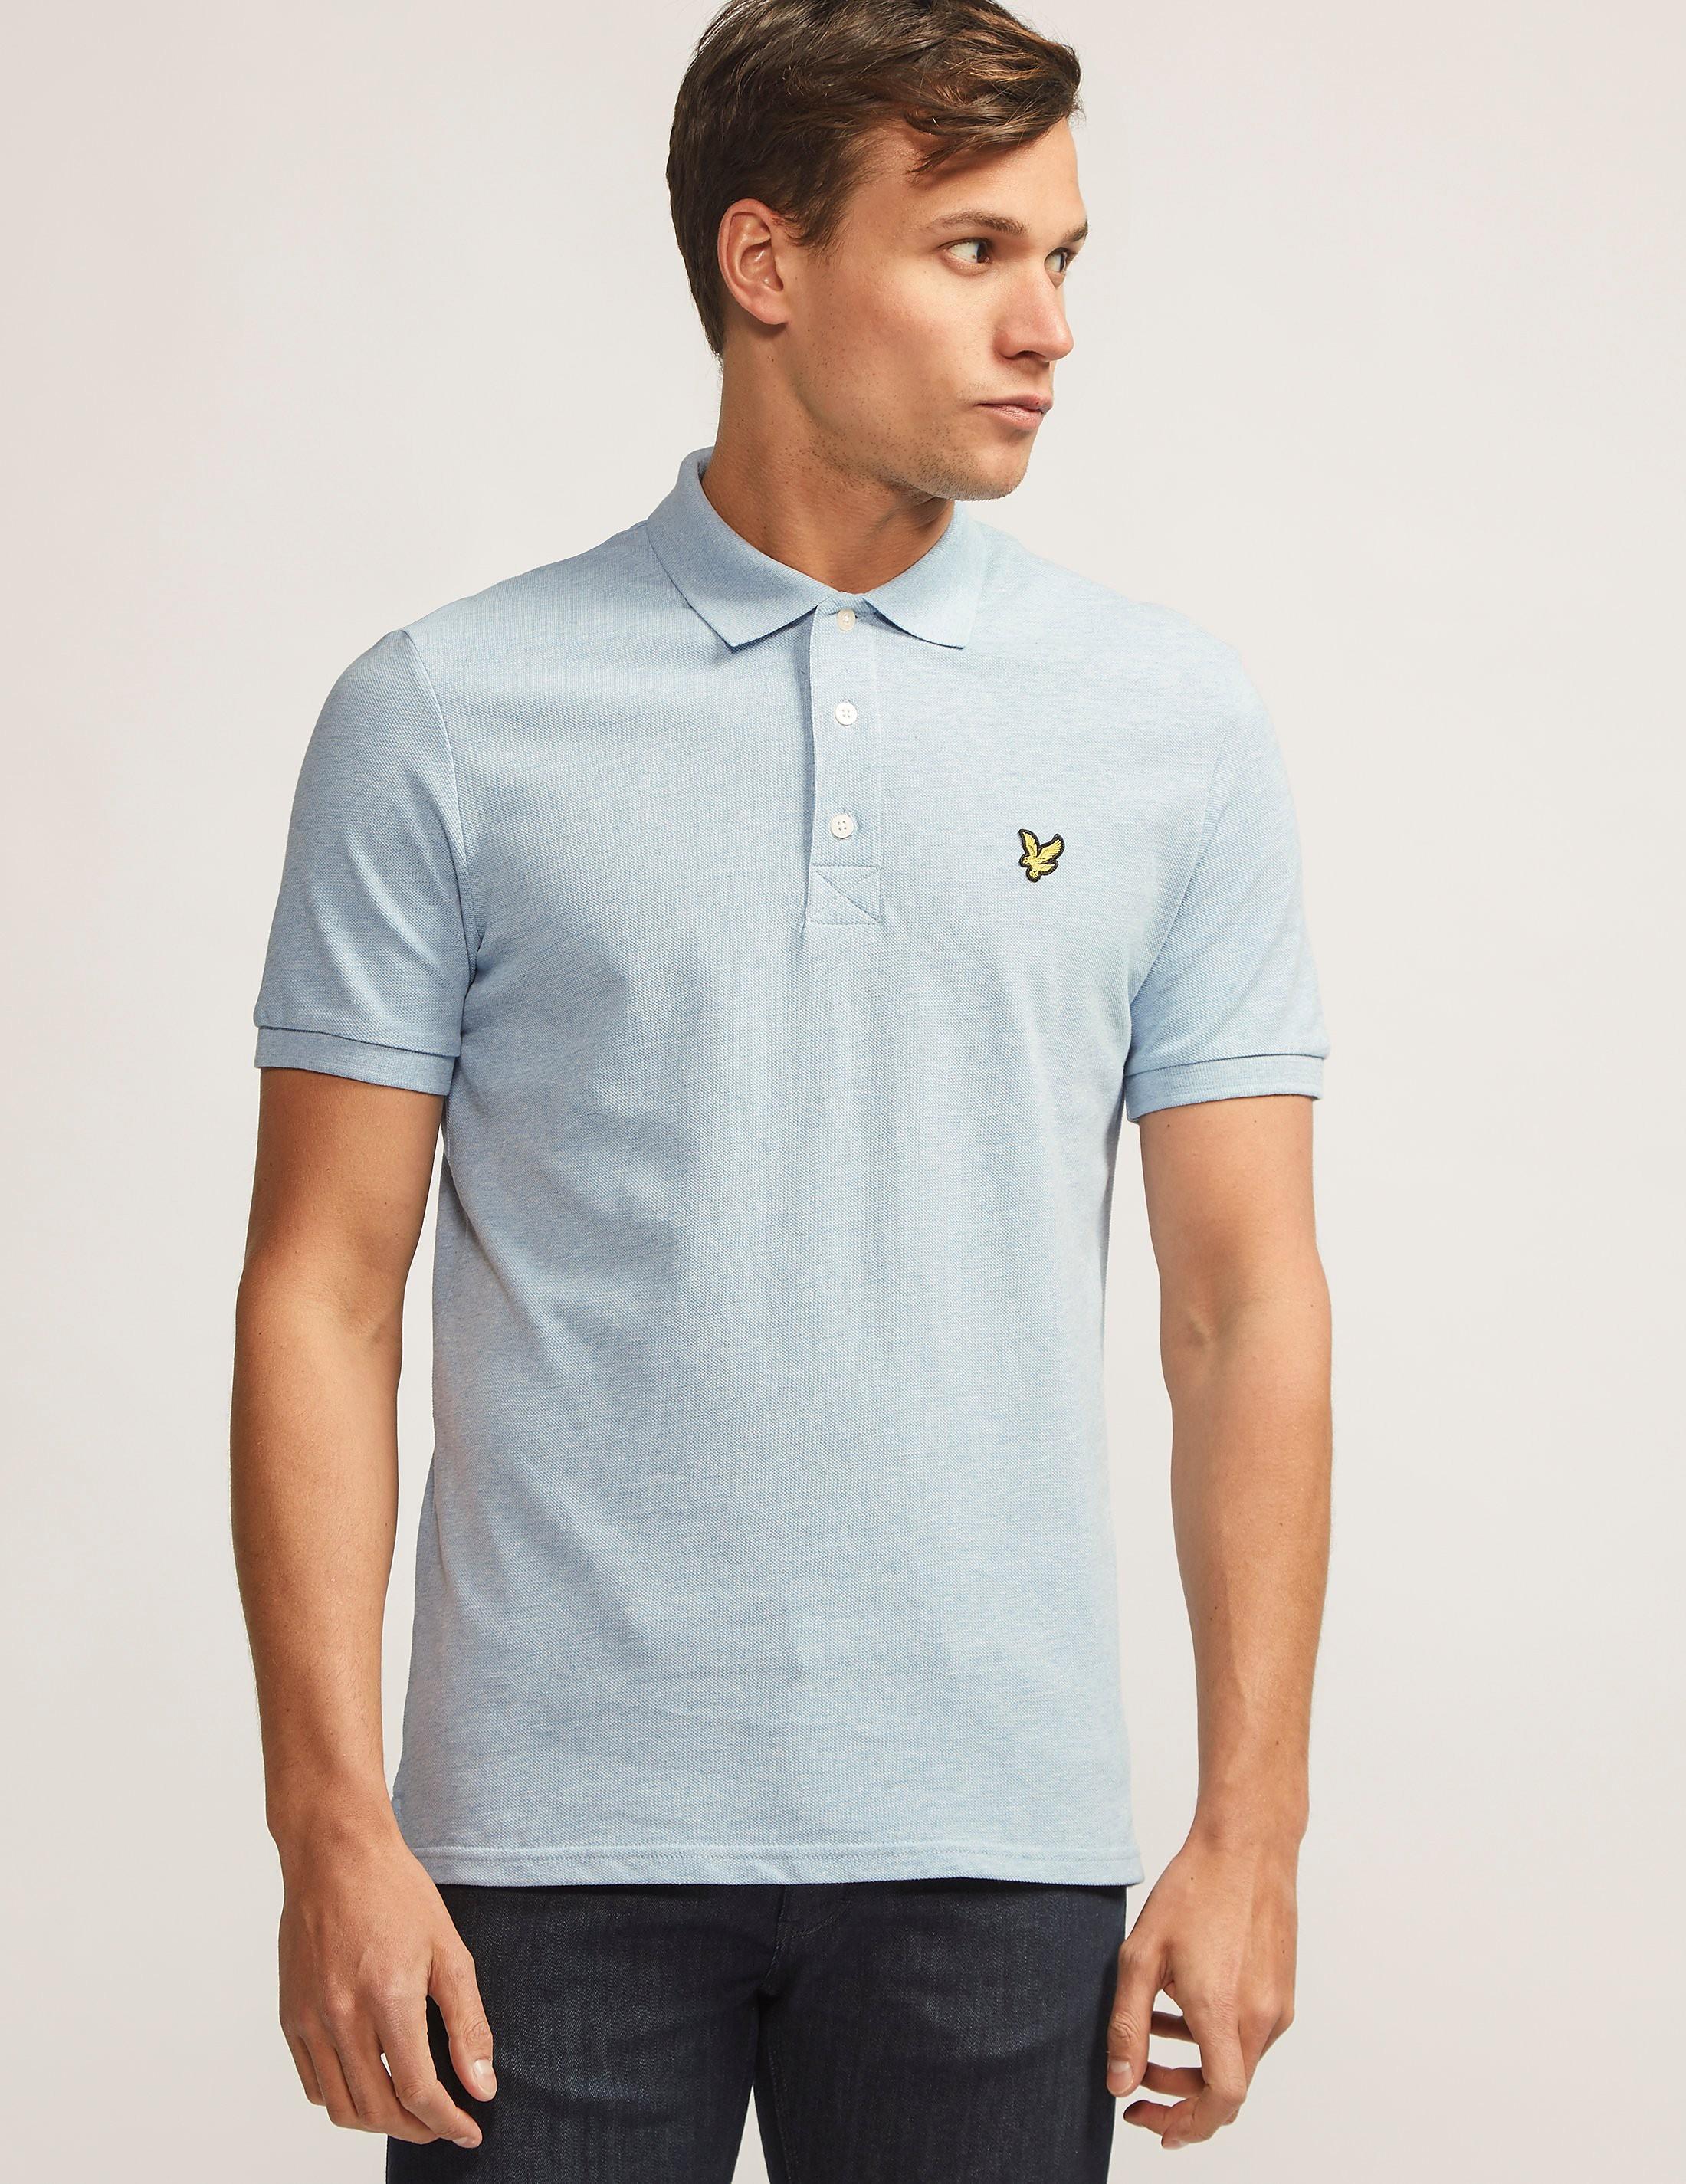 Lyle & Scott Classic Short Sleeve Polo Shirt